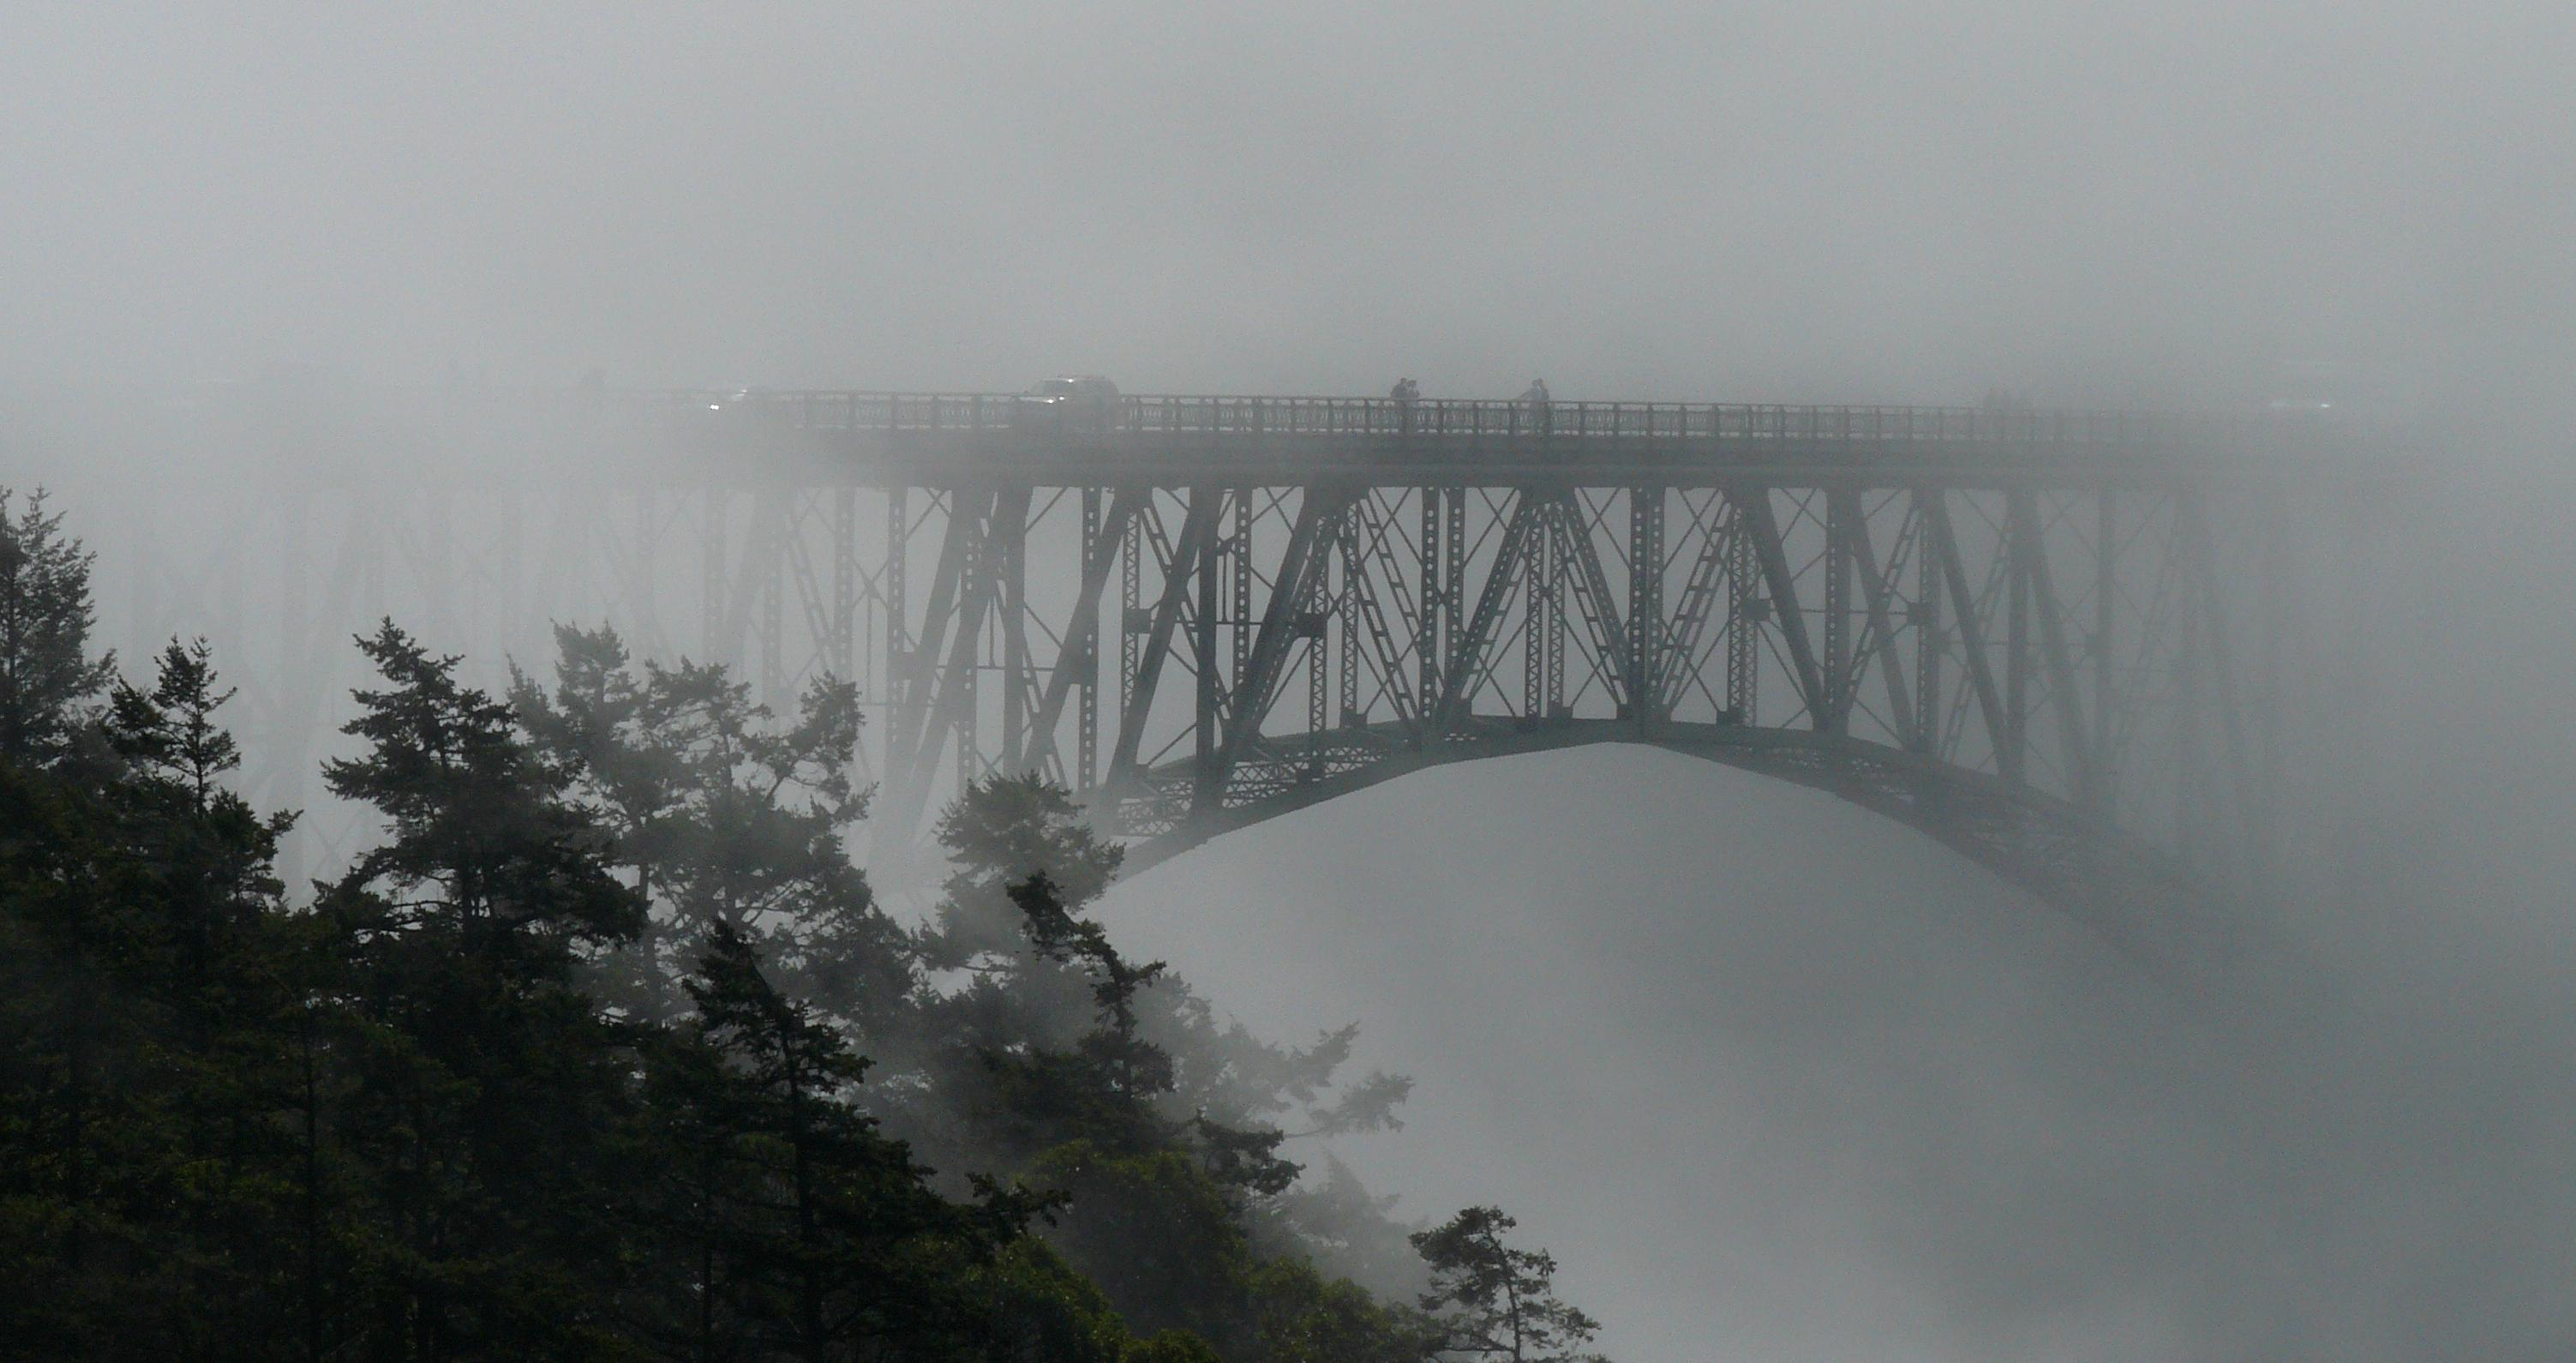 File:Deception Pass Bridge in fog.jpg - Wikimedia Commons